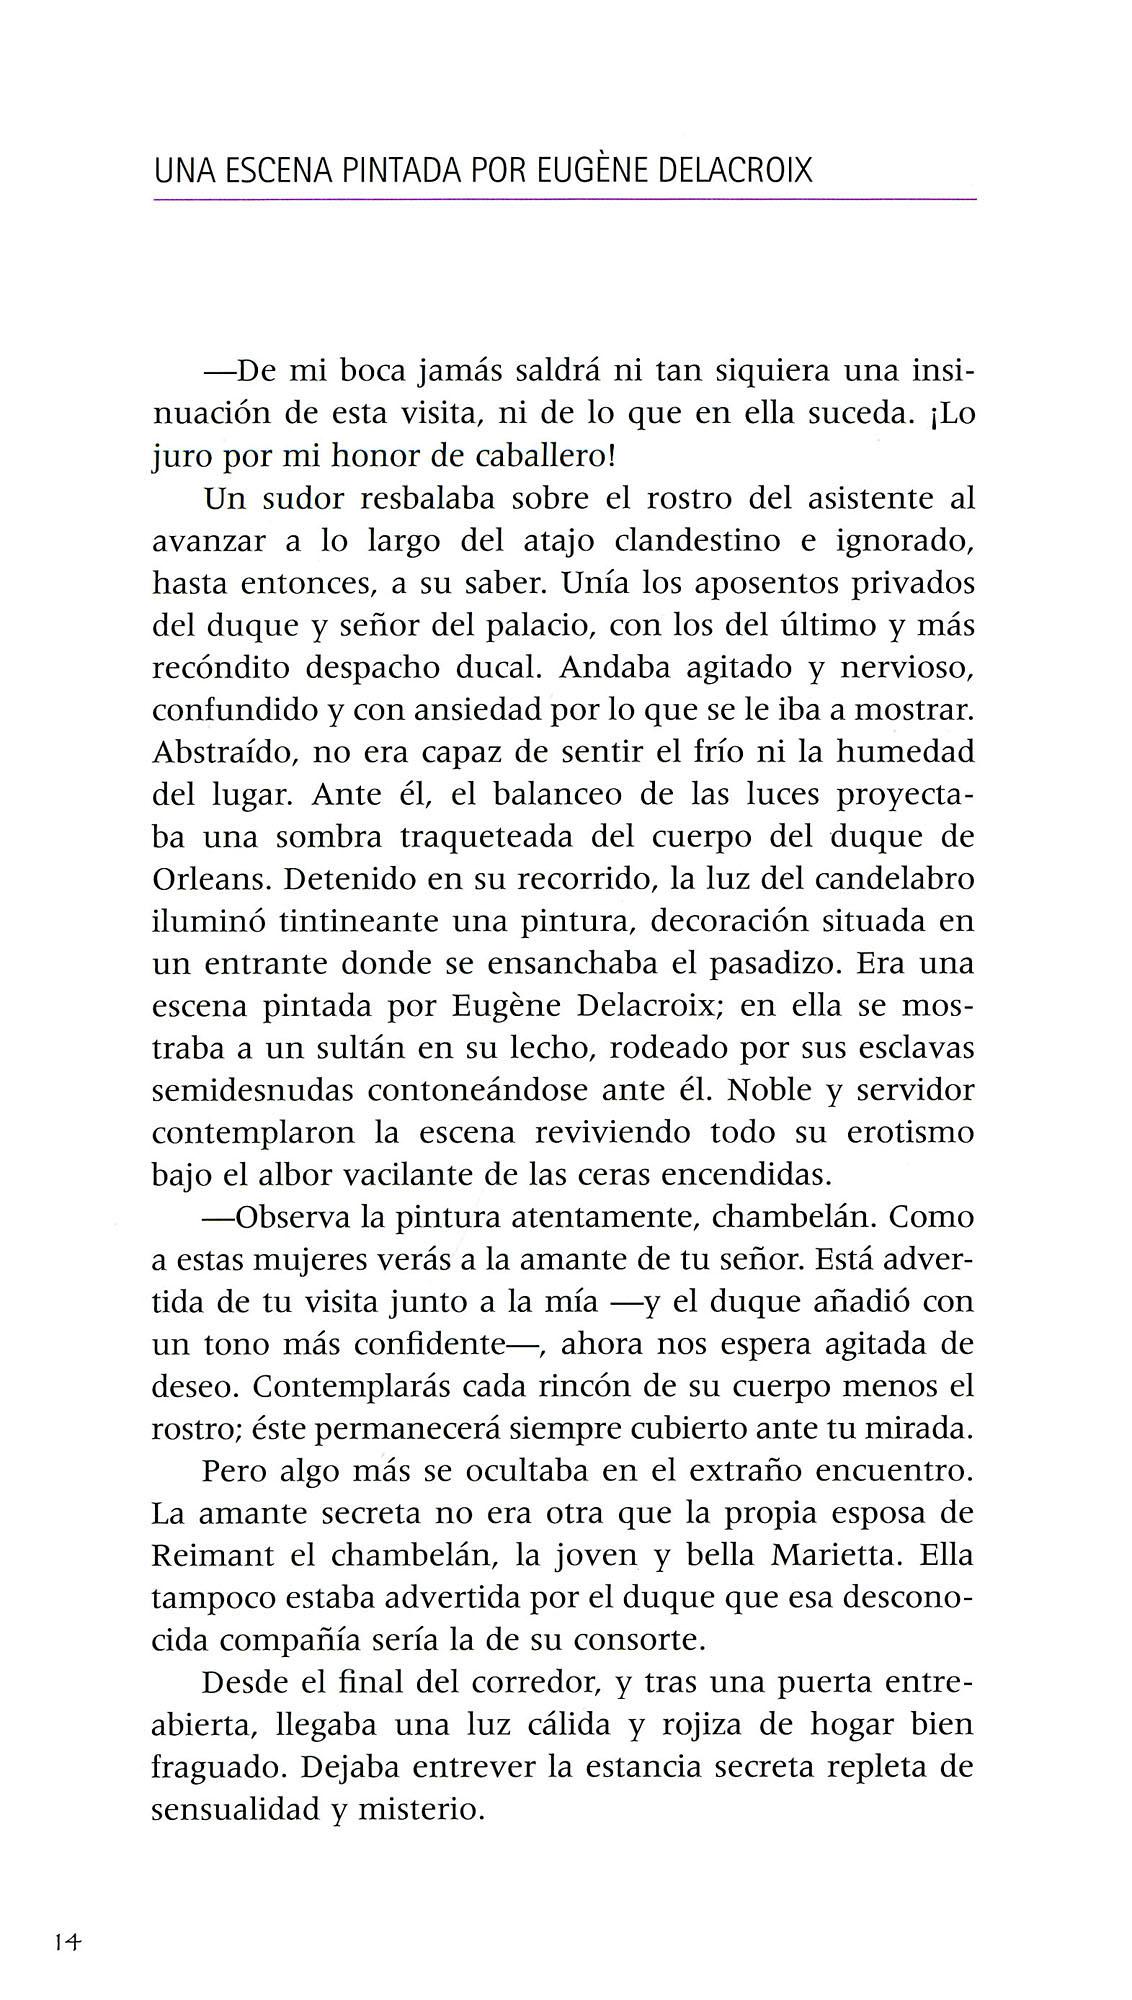 danielvillalobos-calderonsamaniego-story-storyerotic-spanishliterature-7